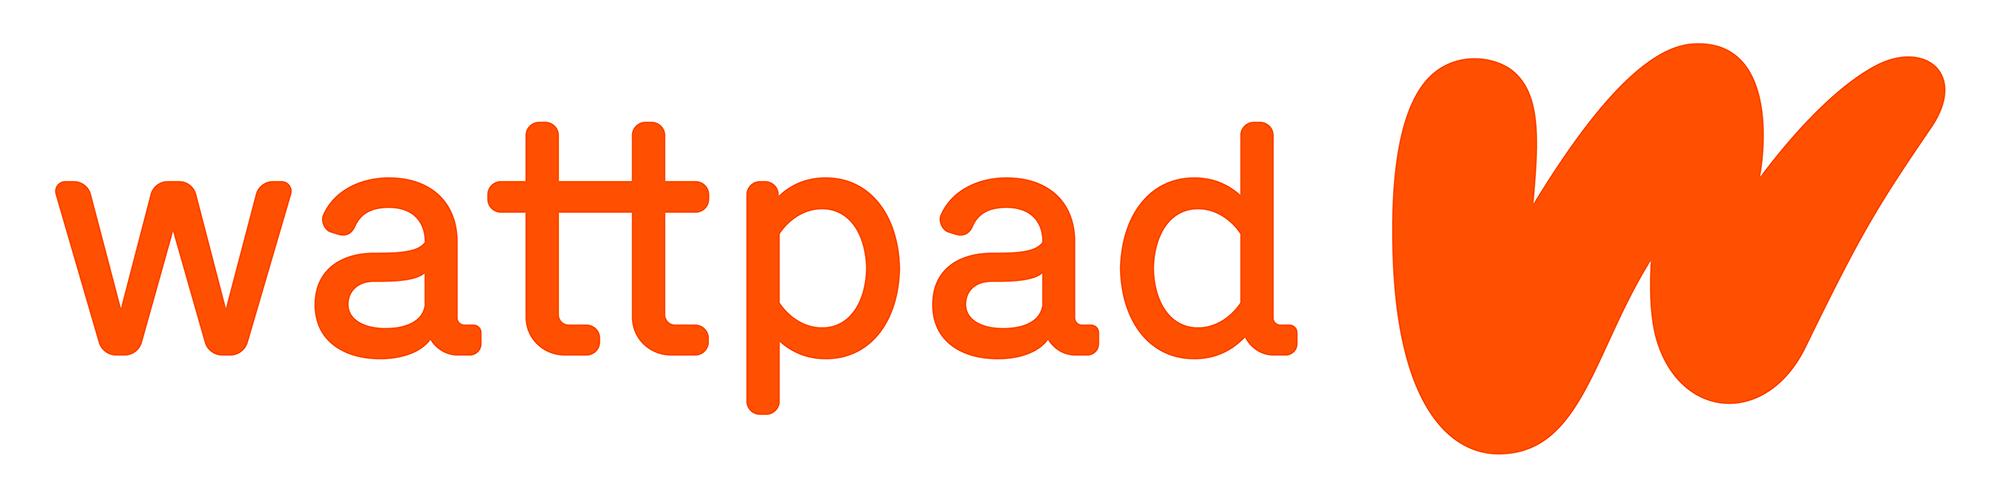 New Logo and Identity for Wattpad